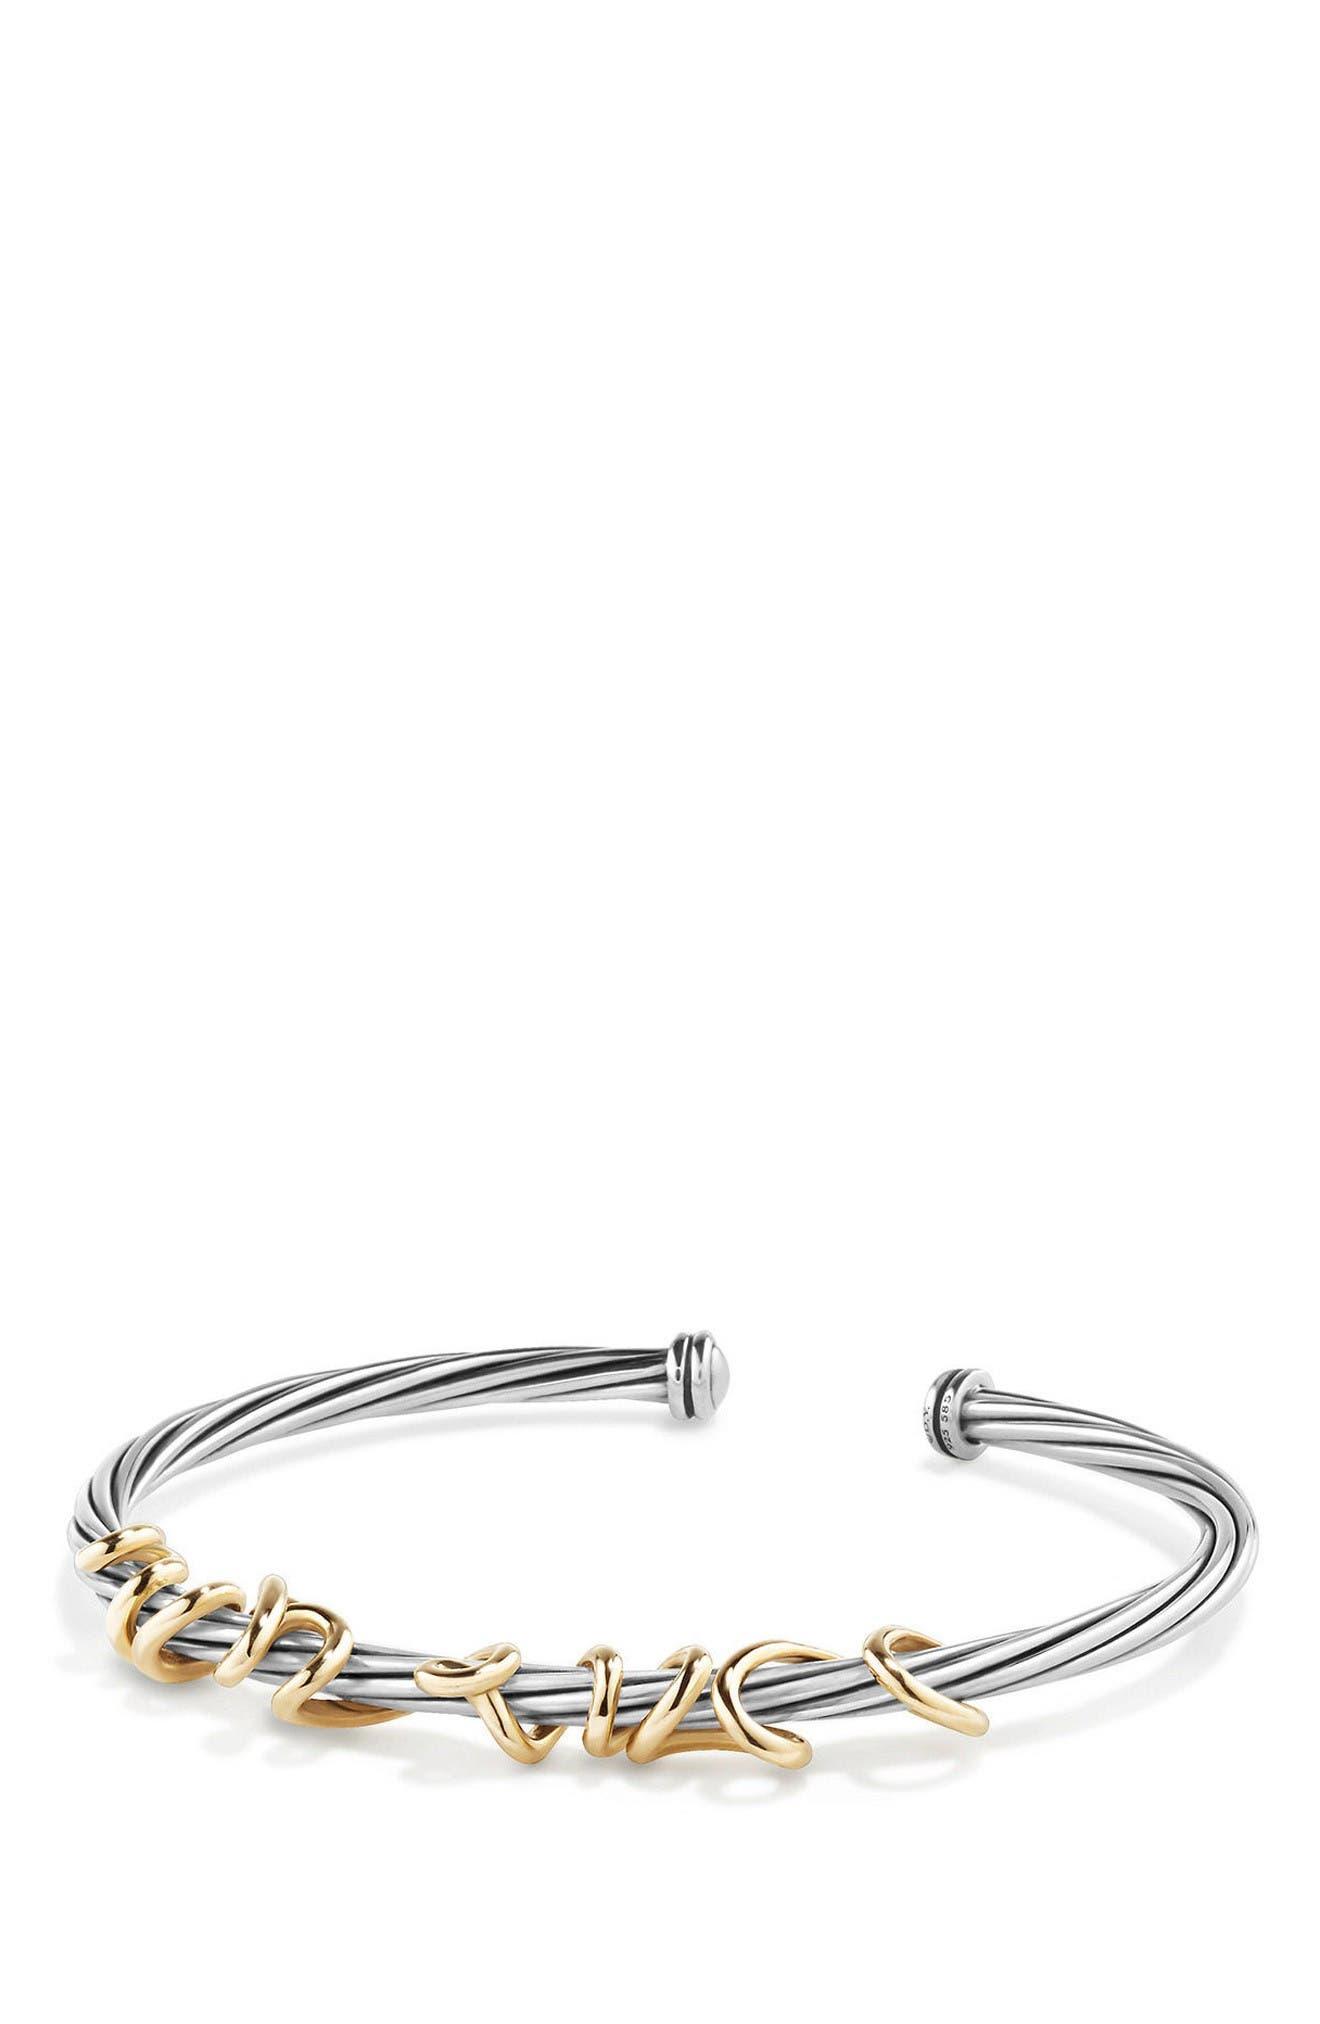 Whispers I Love You Bracelet,                         Main,                         color, Silver/ Gold